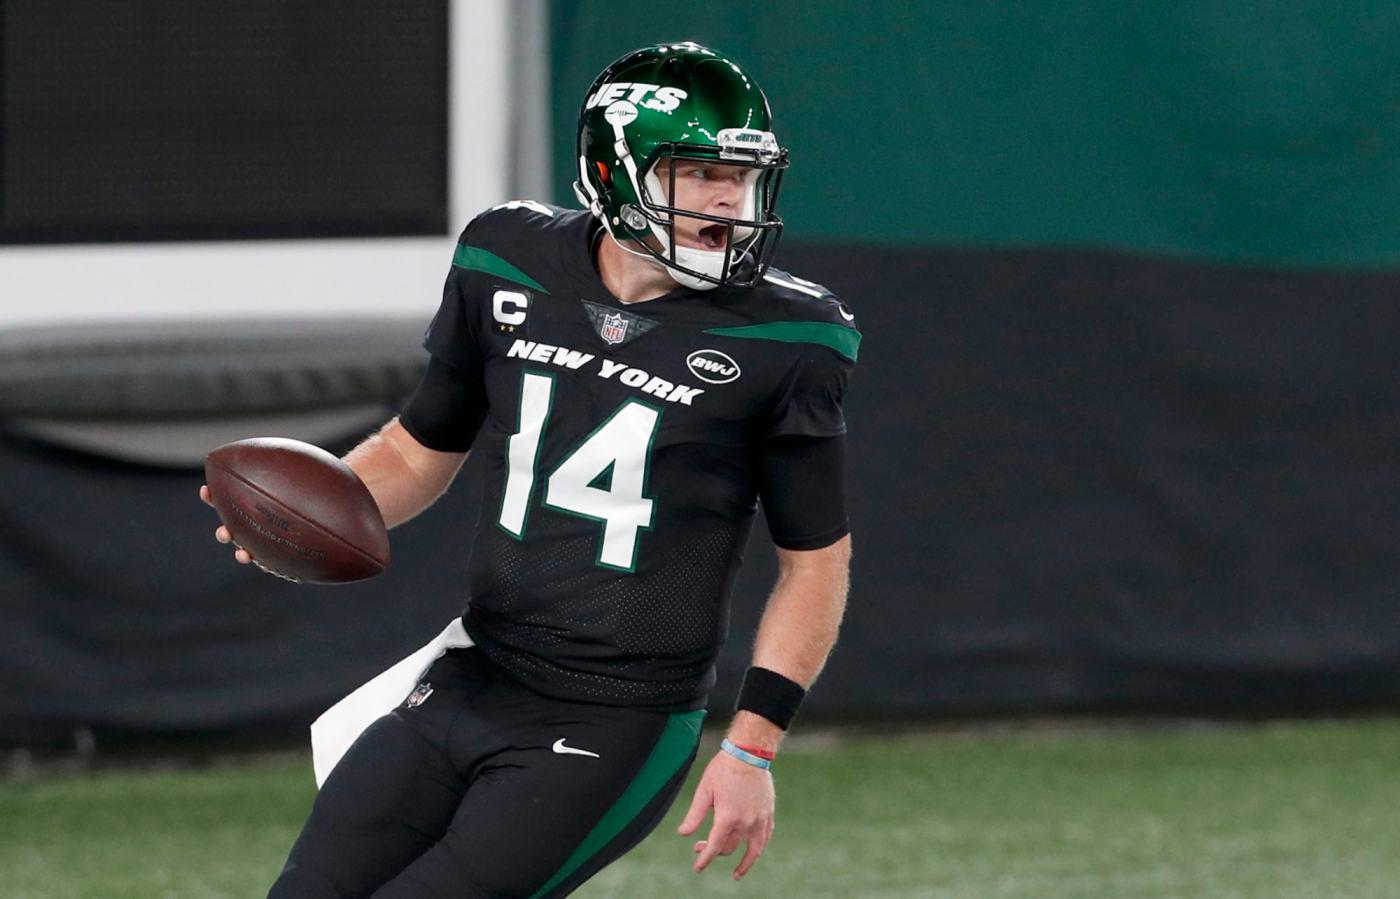 Sam Darnold: 6 NFL teams that could revive quarterback's career in 2021